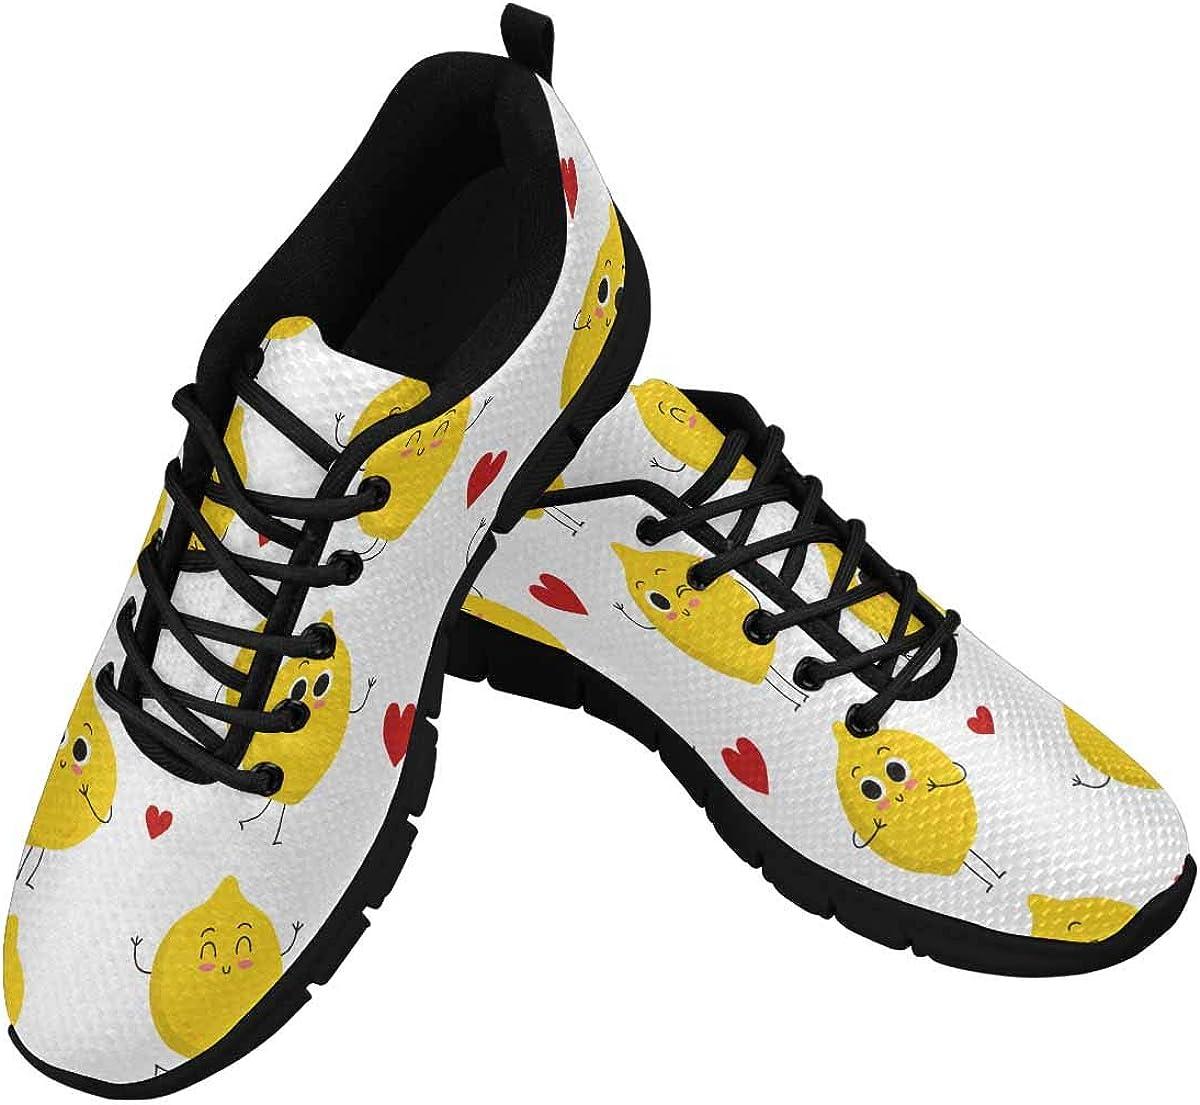 INTERESTPRINT Cute Lemon Heart Women's Athletic Walking Shoes Casual Mesh Comfortable Work Sneakers